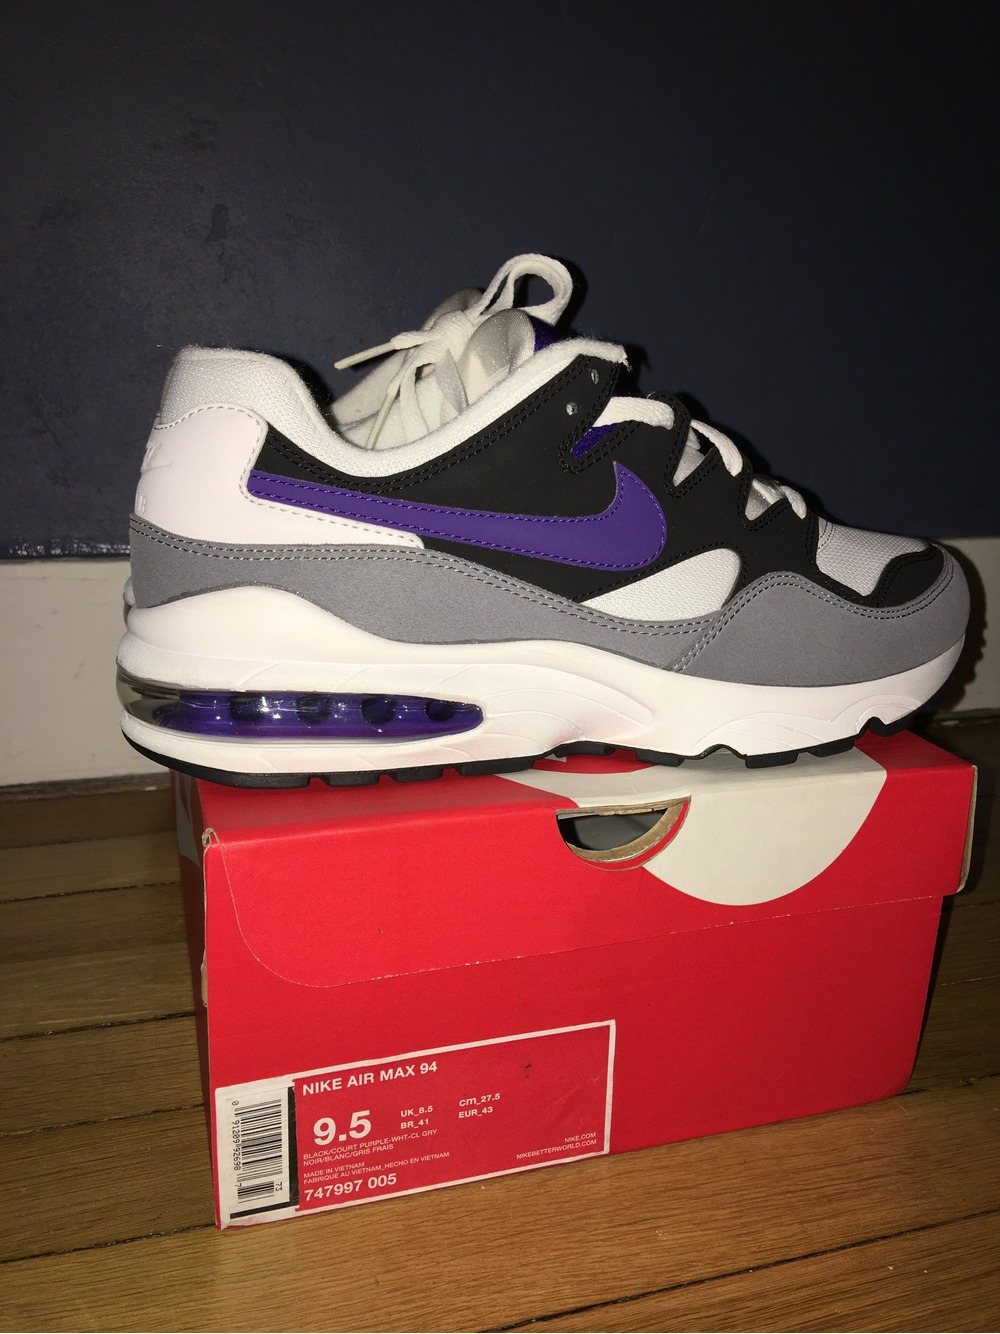 a2a9042a6e ... ireland nike air max 94 og white black purple size 95us 8 e2d62 a8e85